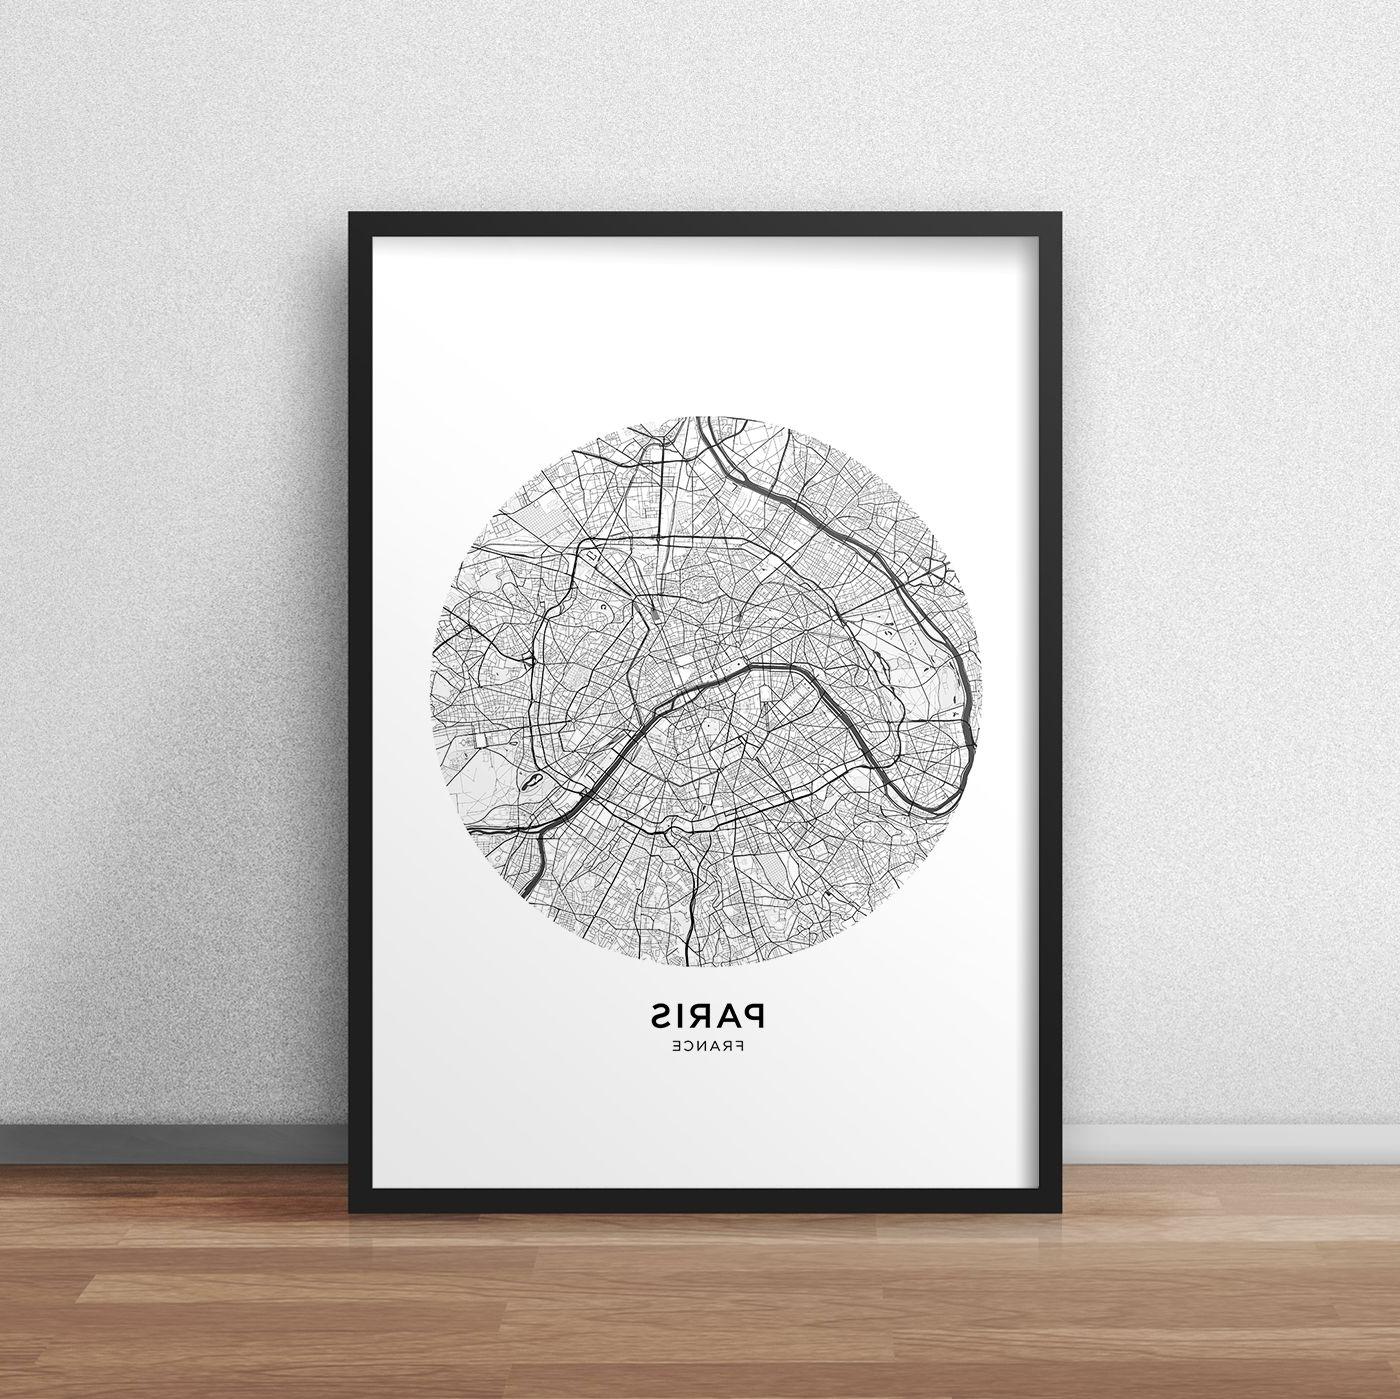 Well Known Paris Map Print, Paris Map Download, Circle City Map Paris, Paris Within Map Of Paris Wall Art (View 3 of 15)